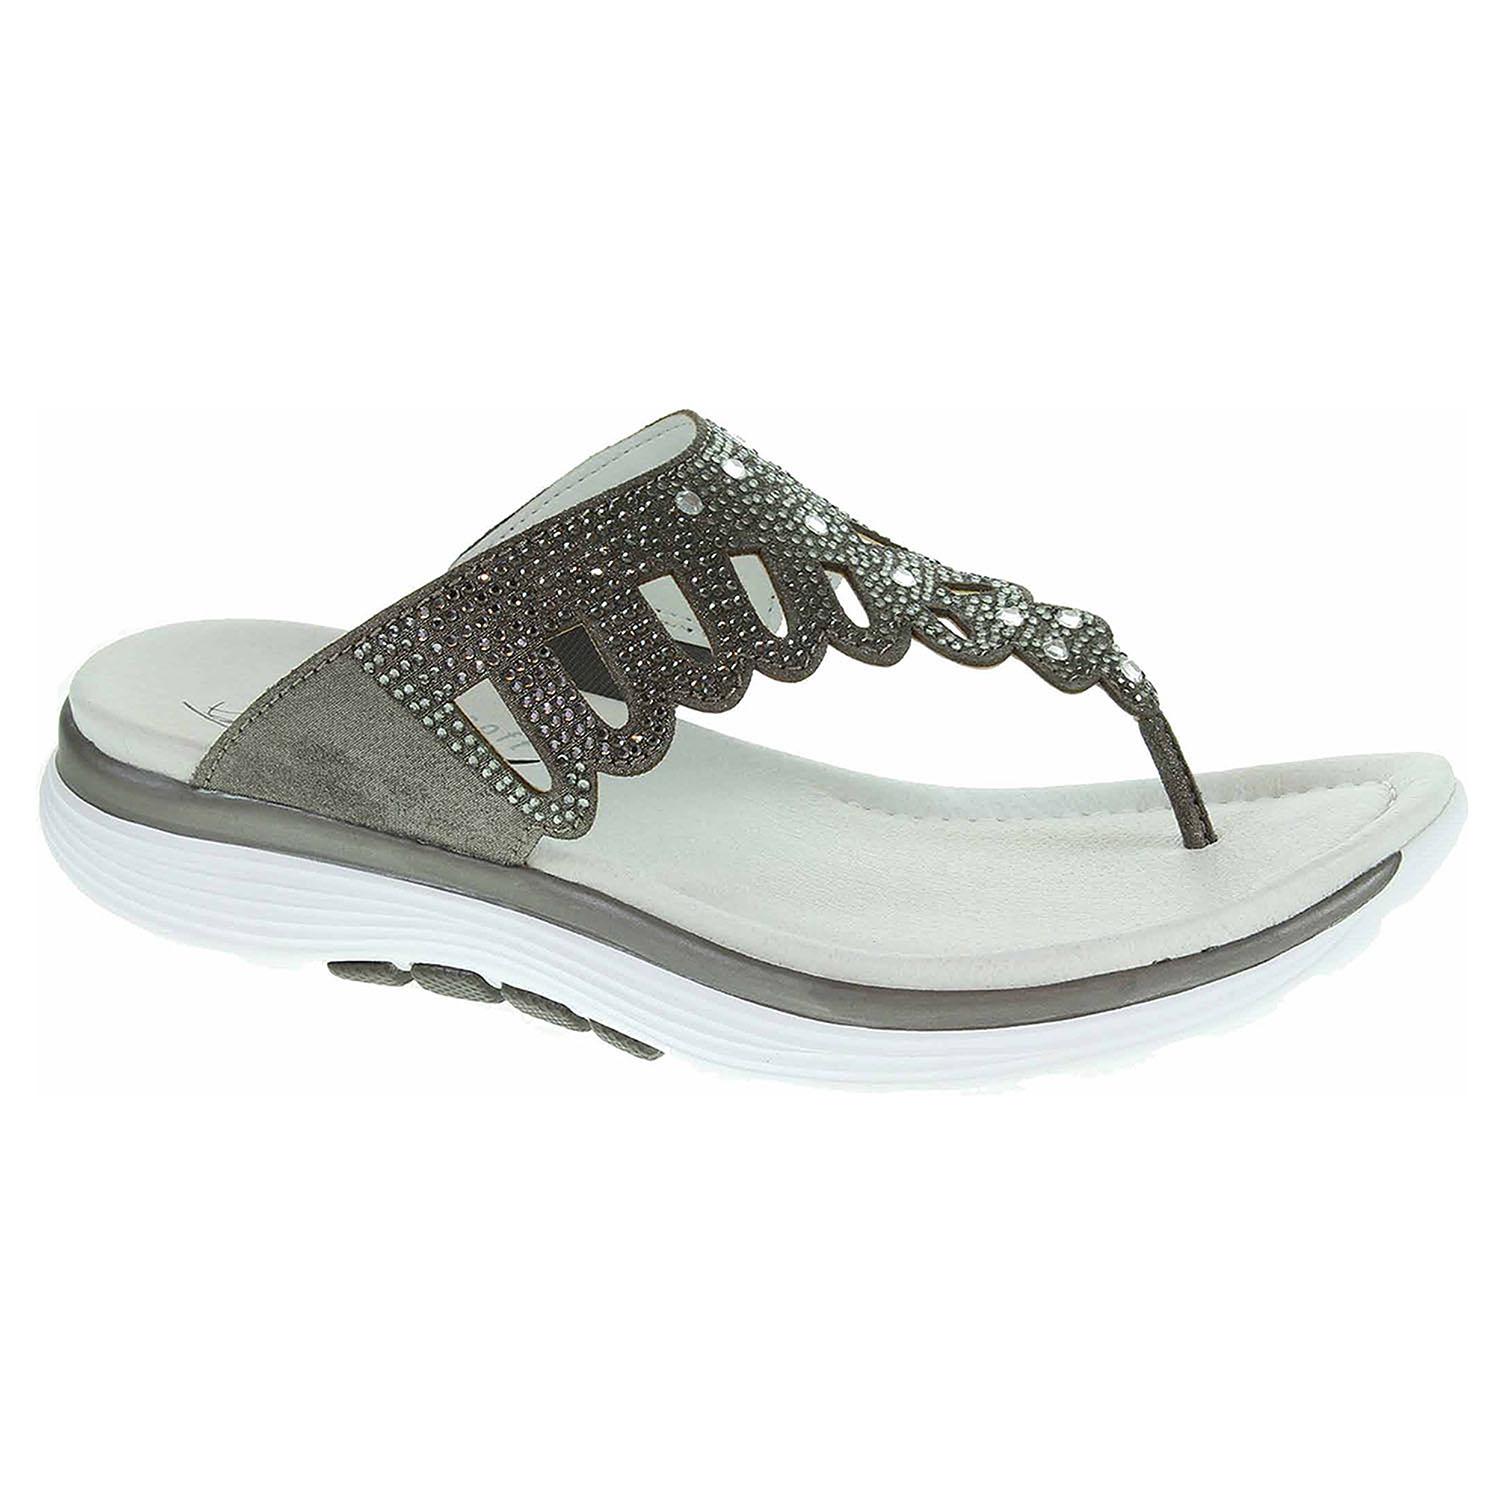 Ecco Dámské pantofle Gabor 86.918.20 marder 23600862